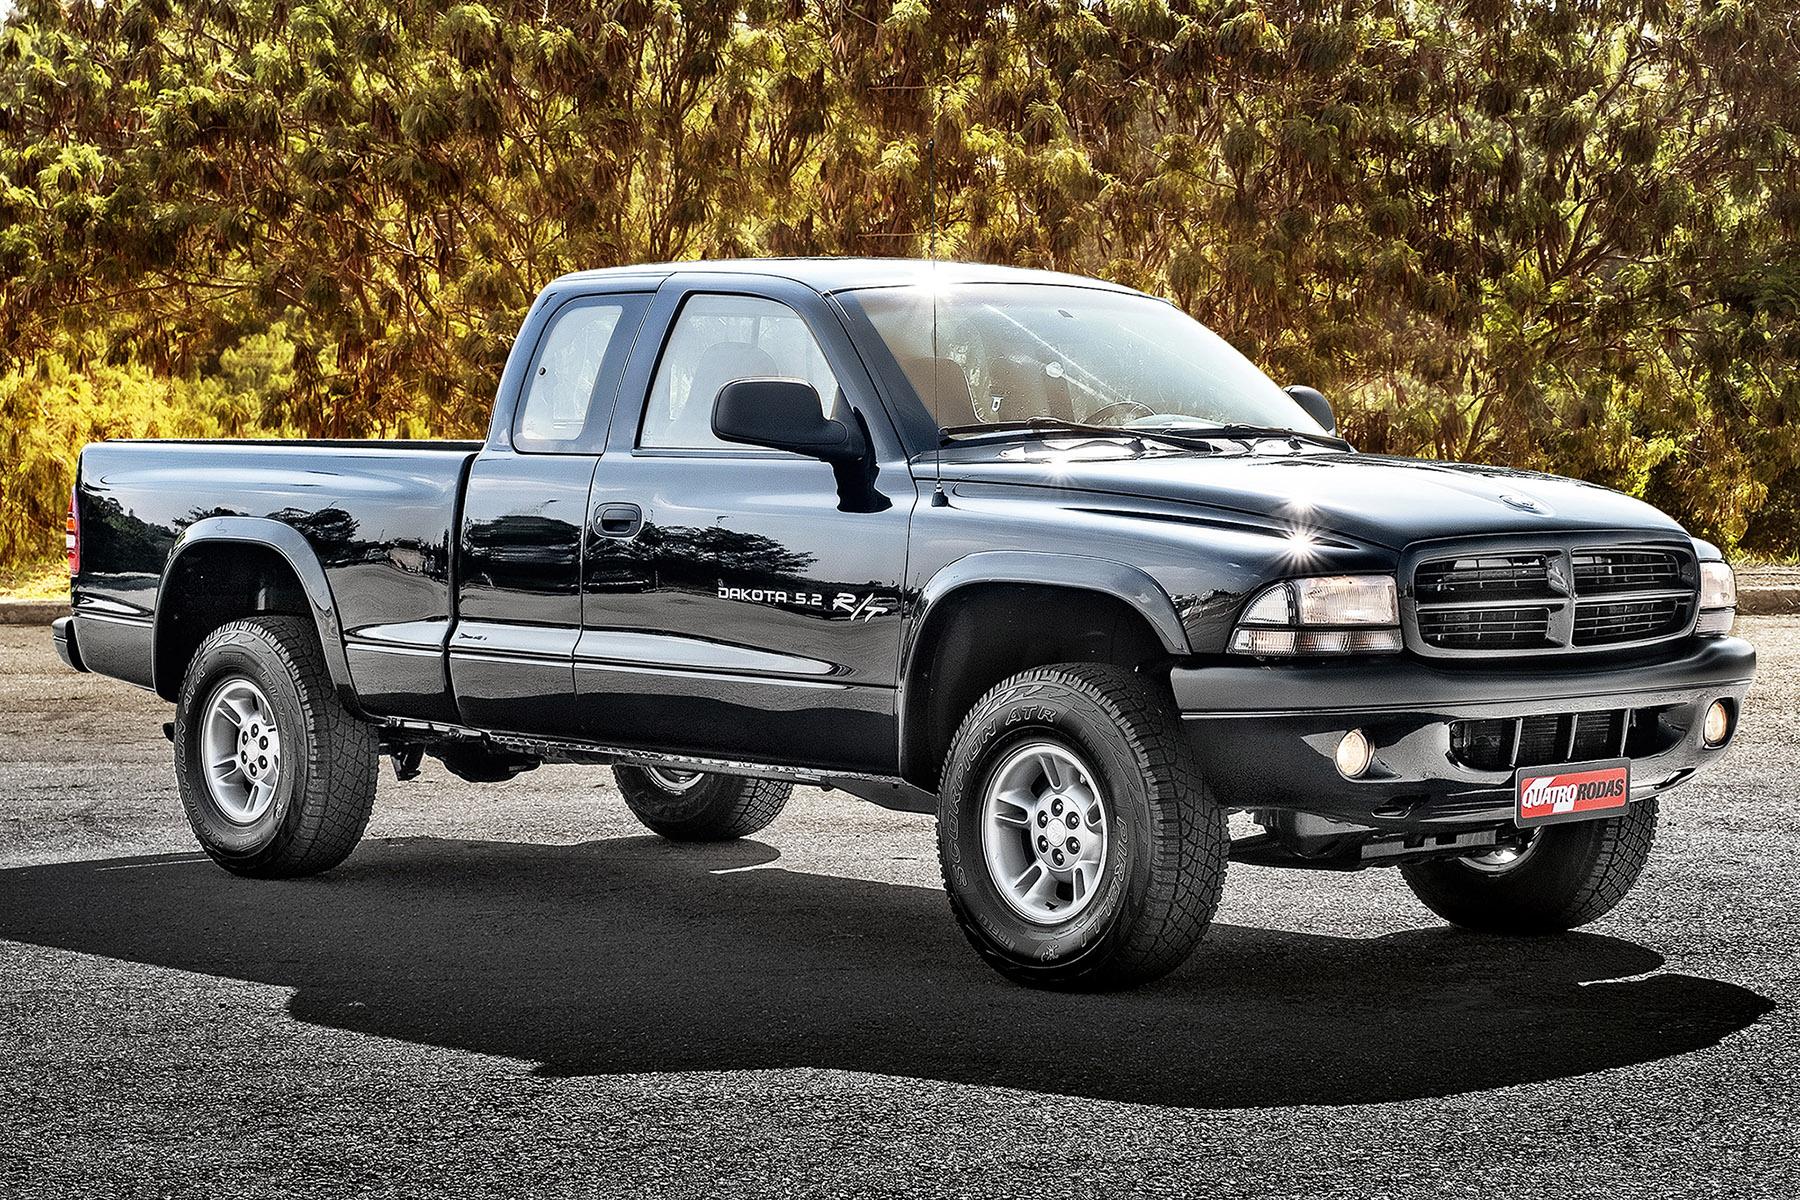 Dodge Dakota frente